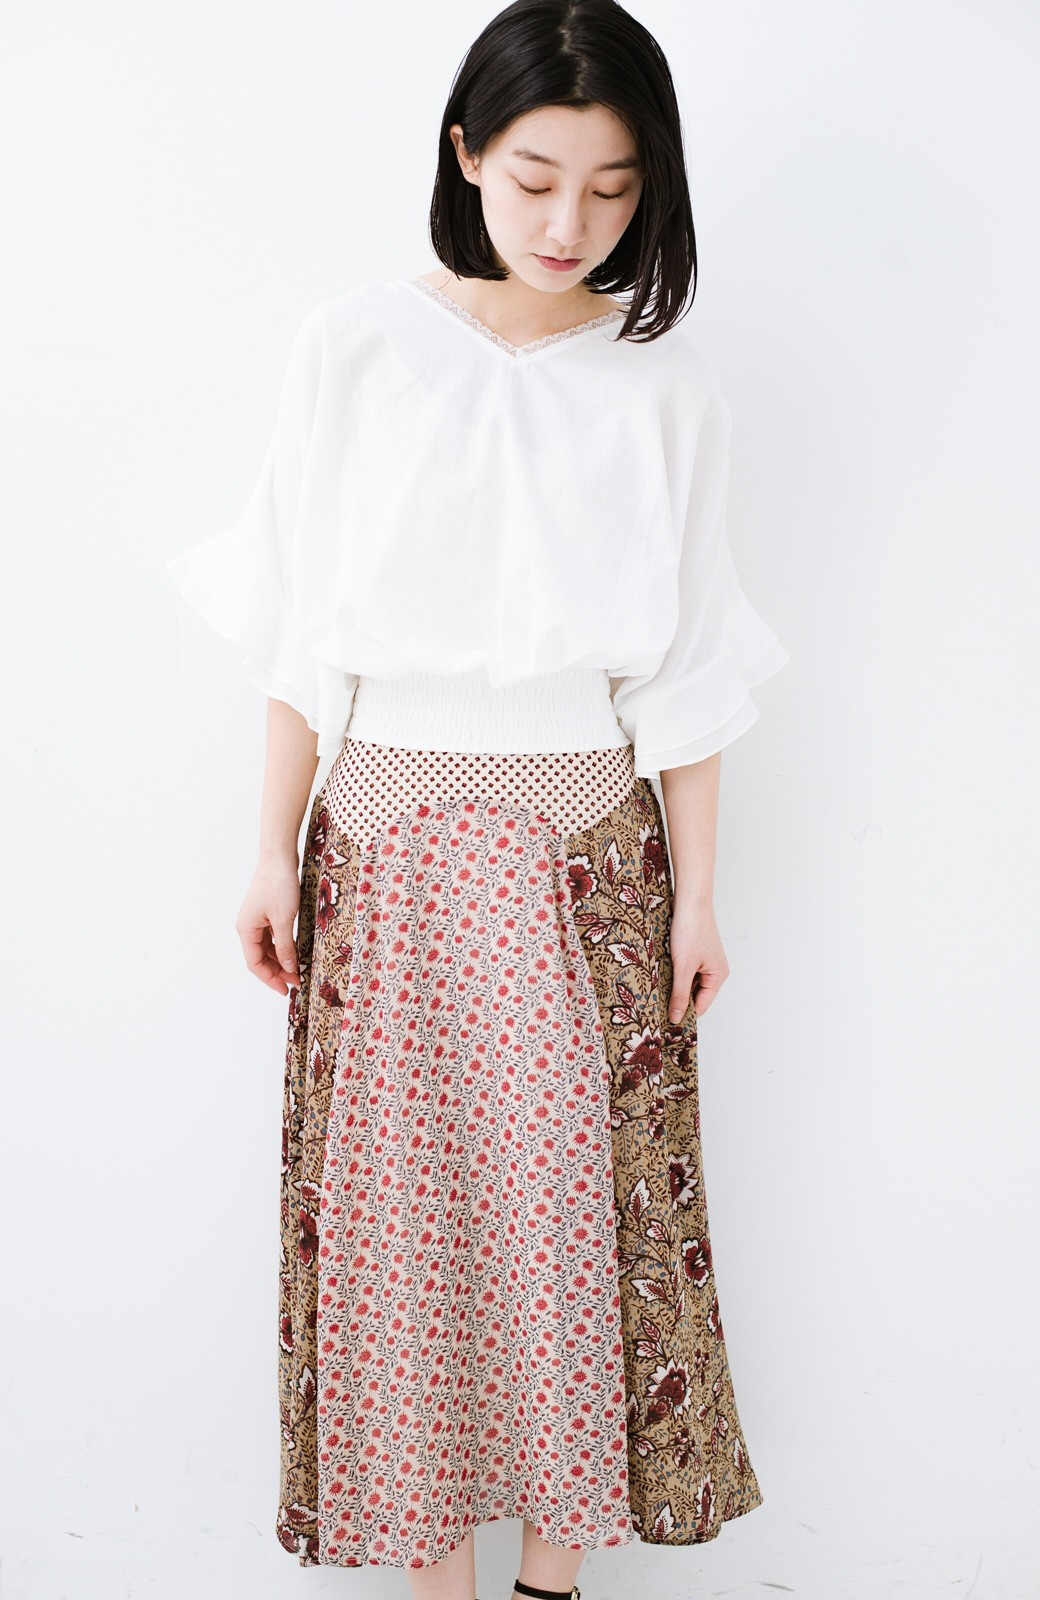 haco! 【洗濯機洗いOK】シンプルなトップスに合わせるだけでかわいくなれる MIX柄スカート <ベージュ系その他>の商品写真13